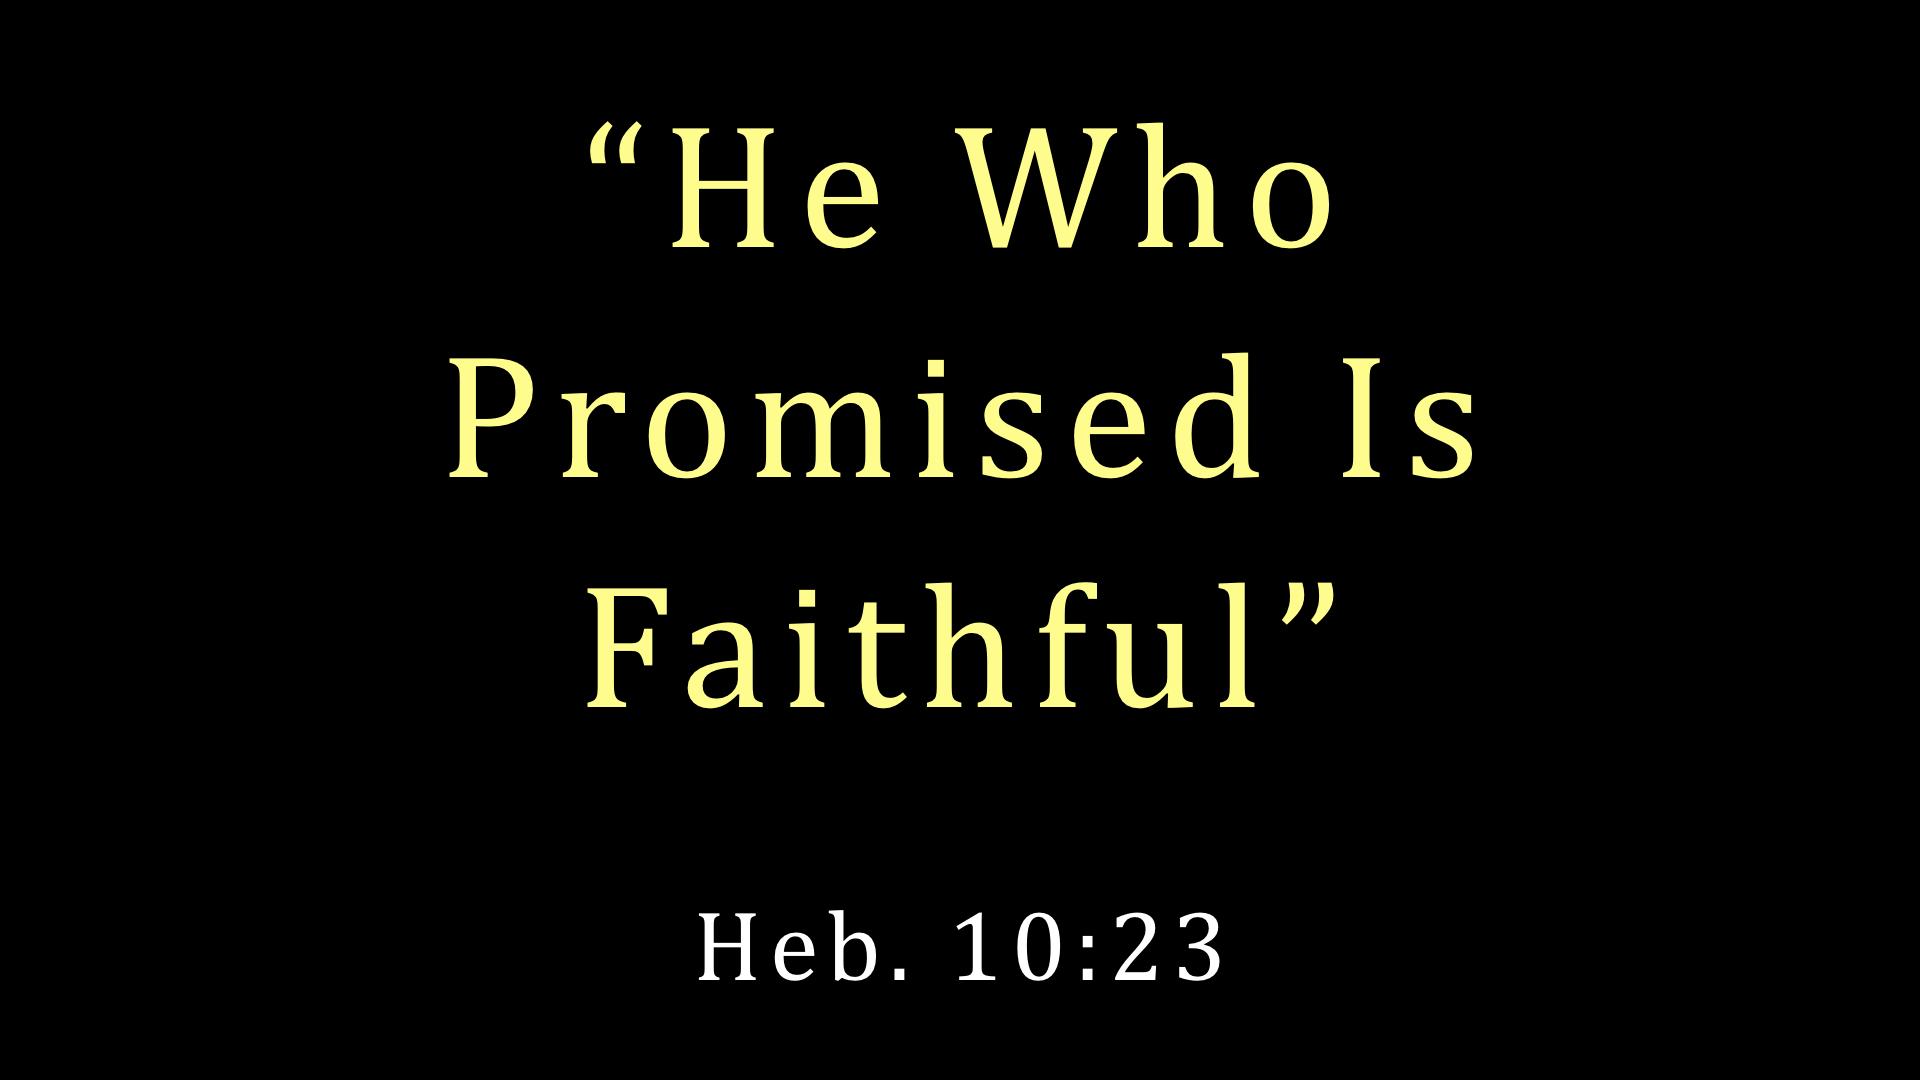 He Who Promised Is Faithful WIDE.001.jpeg